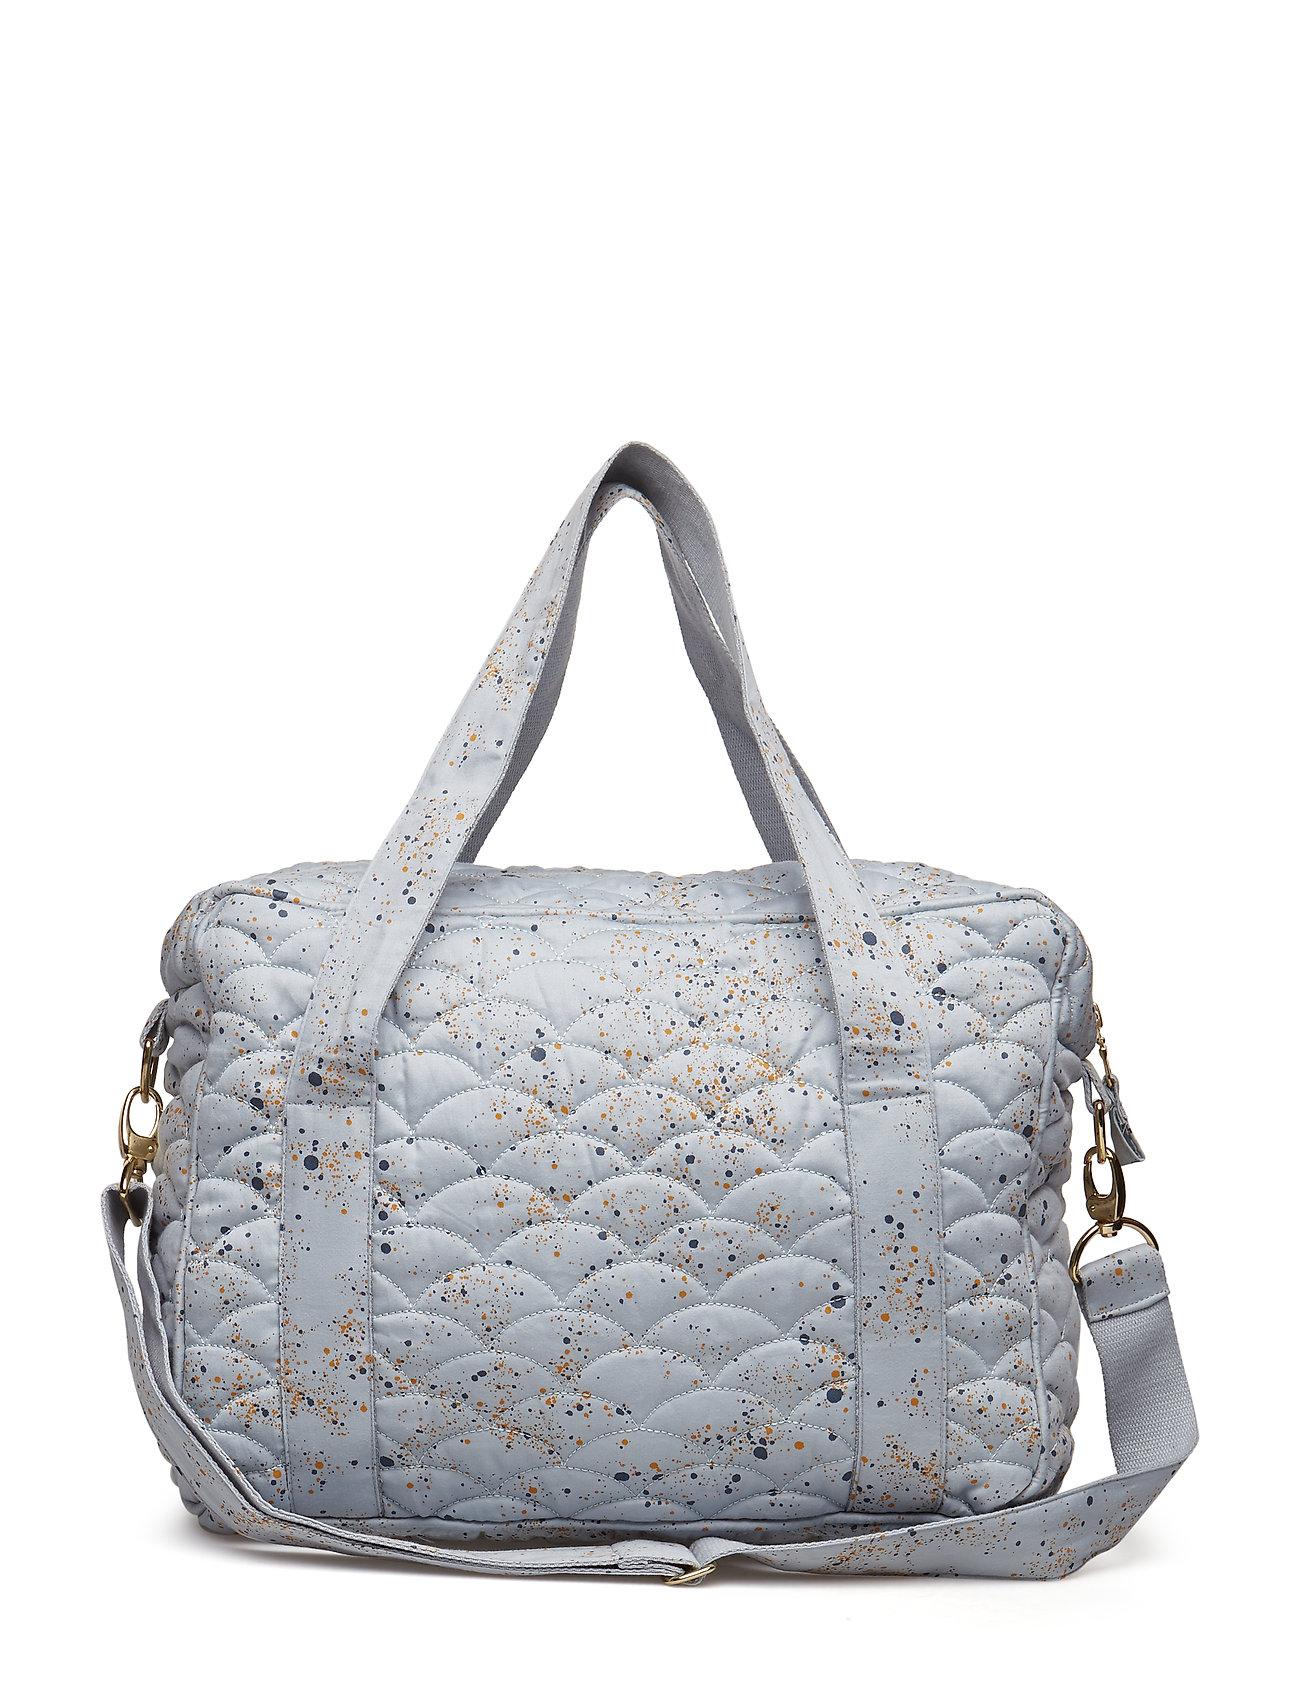 Soft Gallery Nursery Bag - OCEAN GREY, AOP MINI SPLASH BLUE